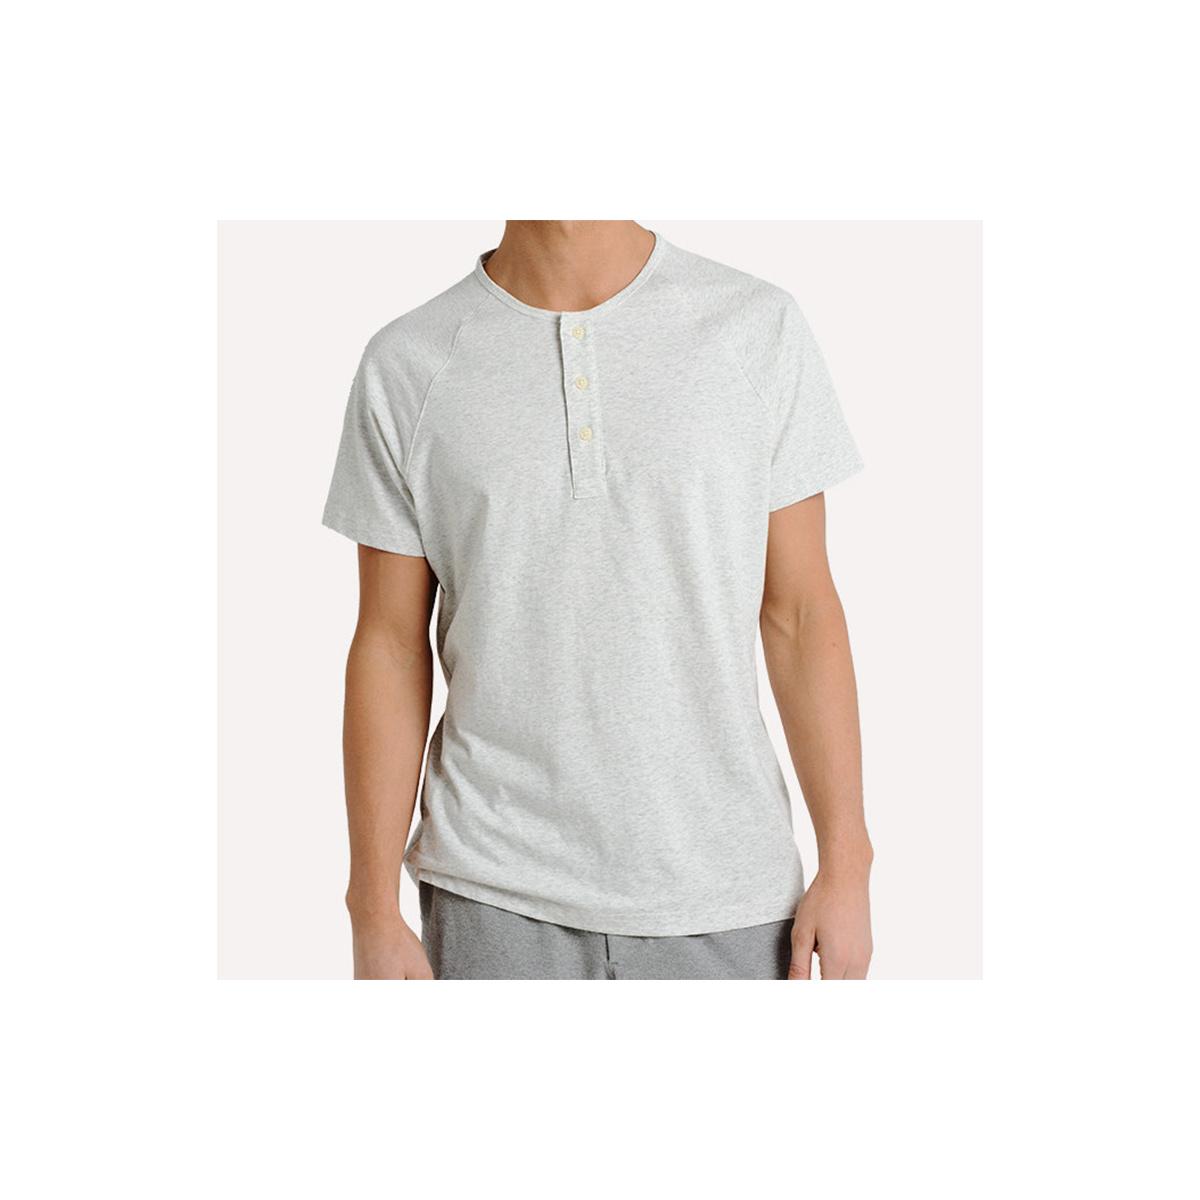 Men's Puremeso Henley Short Sleeve